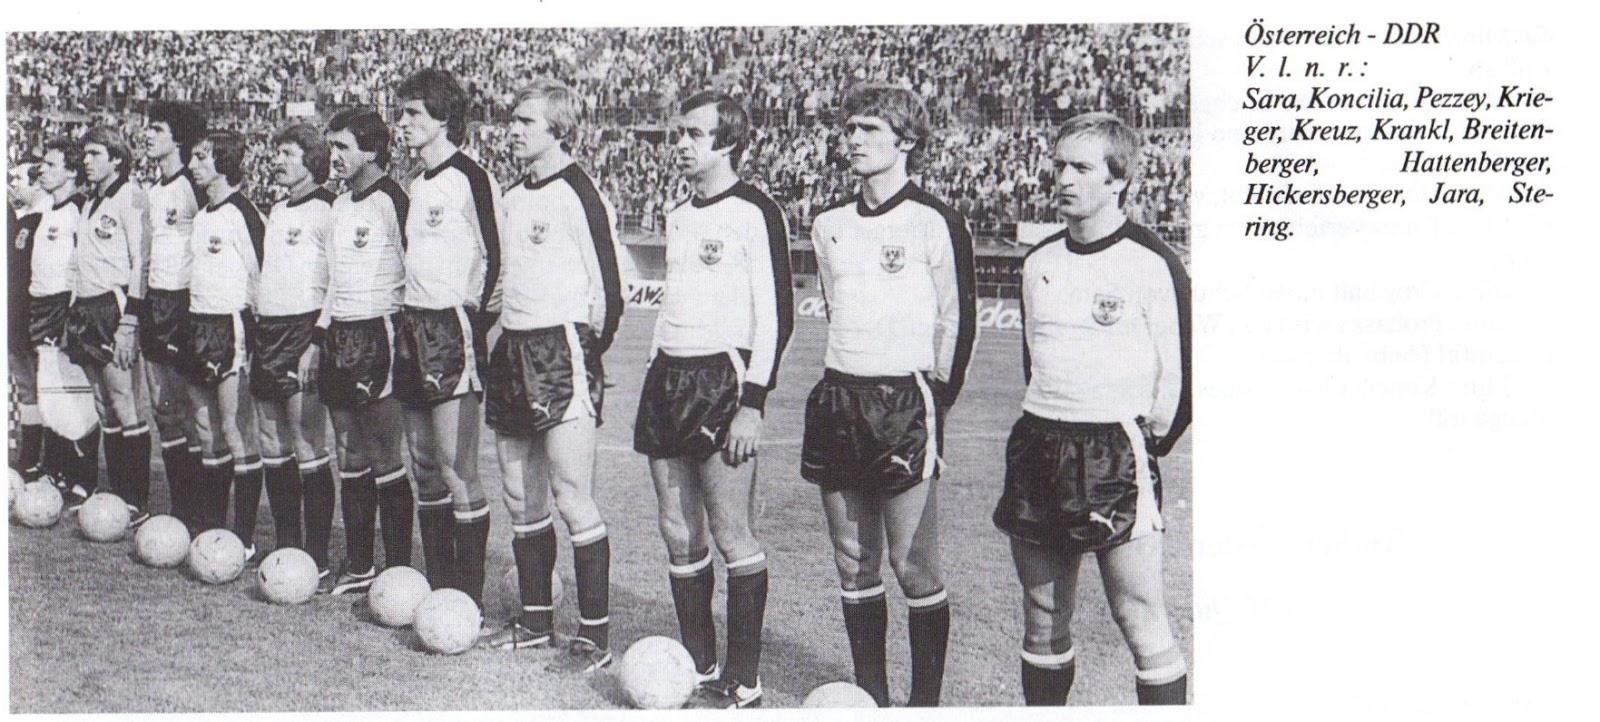 soccer nostalgia international season 1977 78, part 2  fu%c3%83%c2%9fball shorts c 24 #1